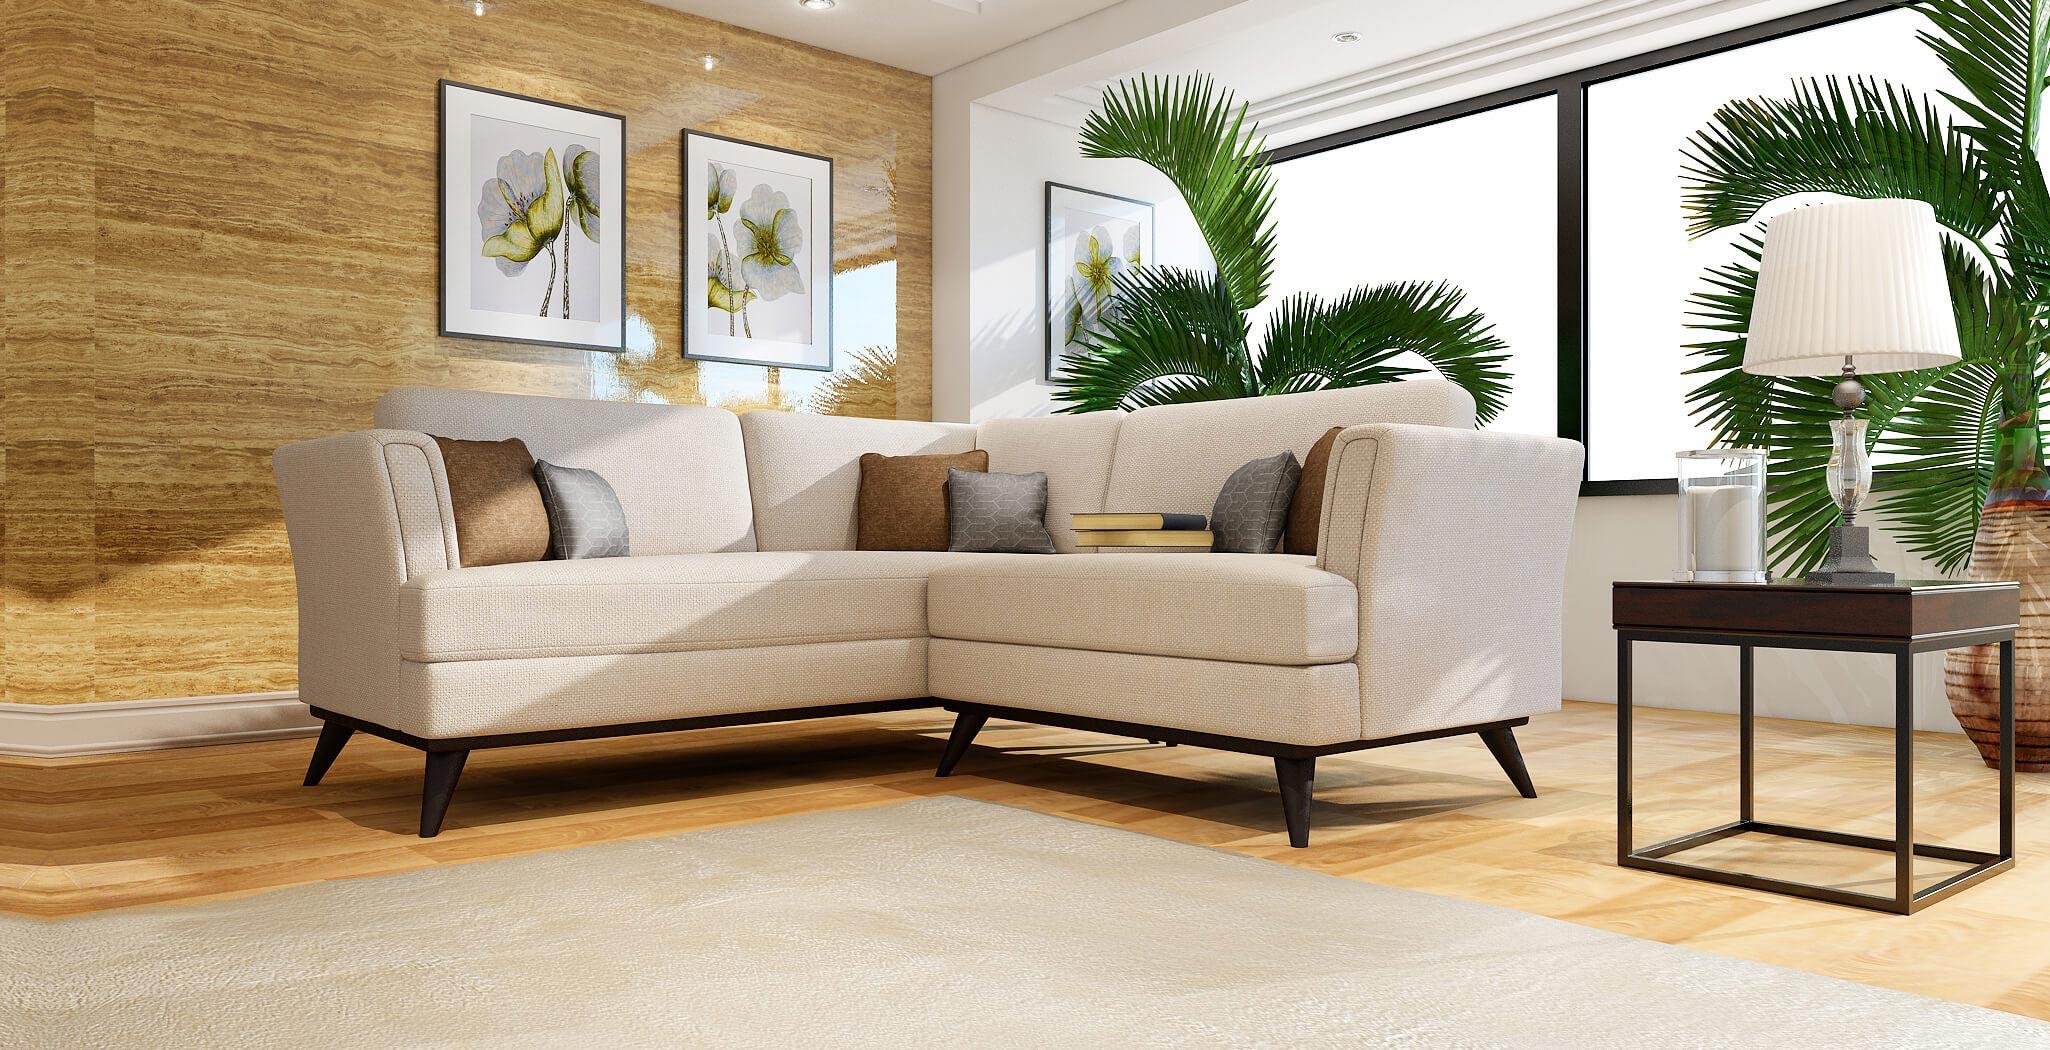 antalya sectional furniture gallery 1